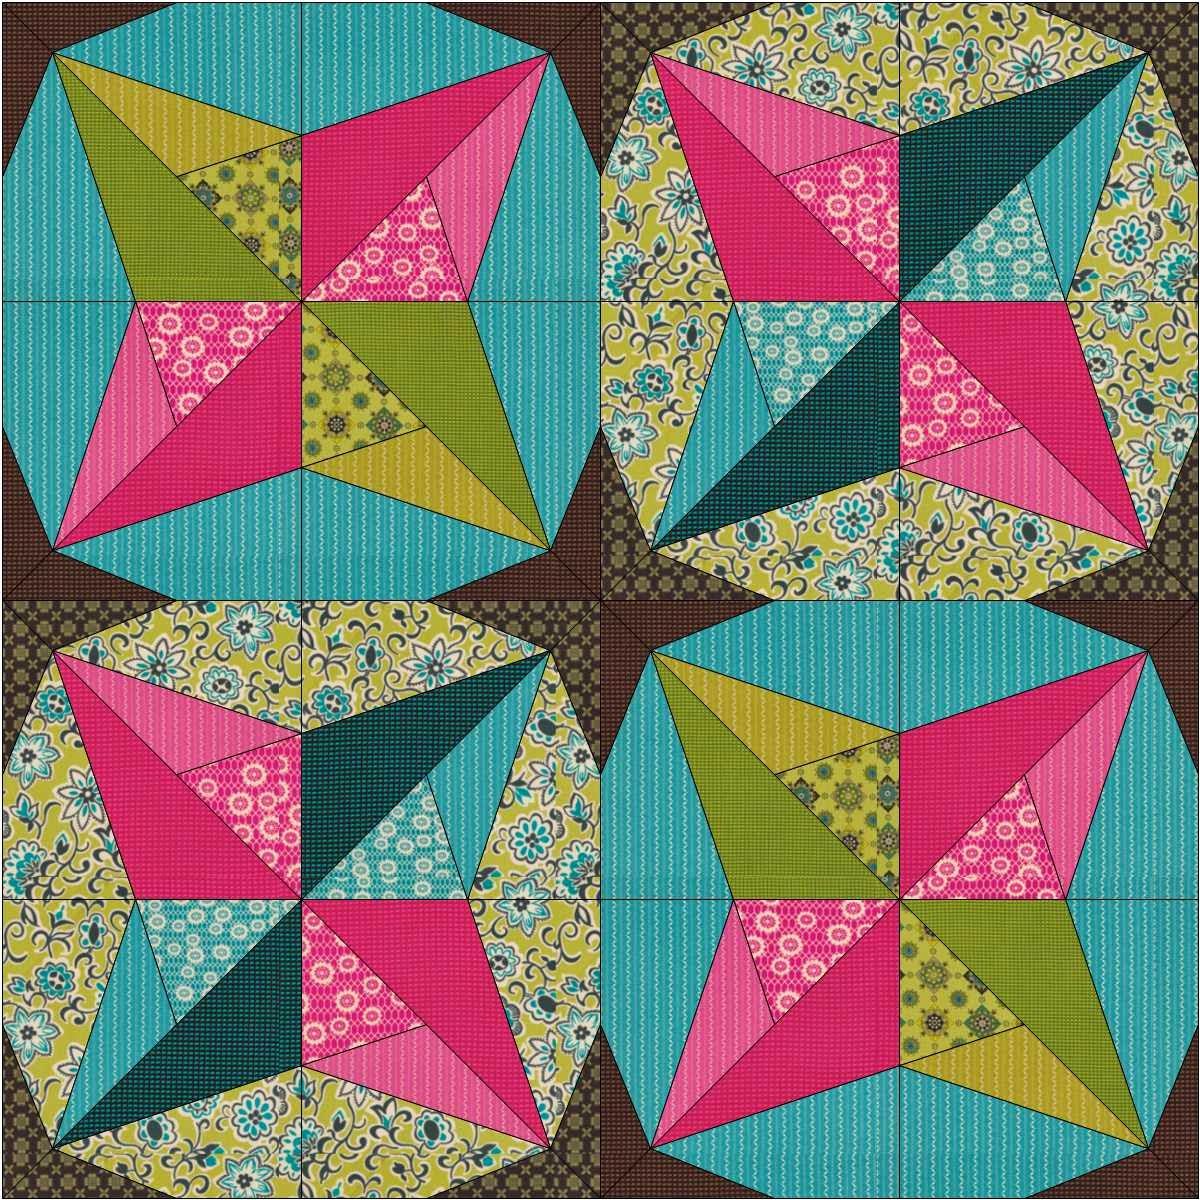 Quiltmaker 100 Blocks Vol 9